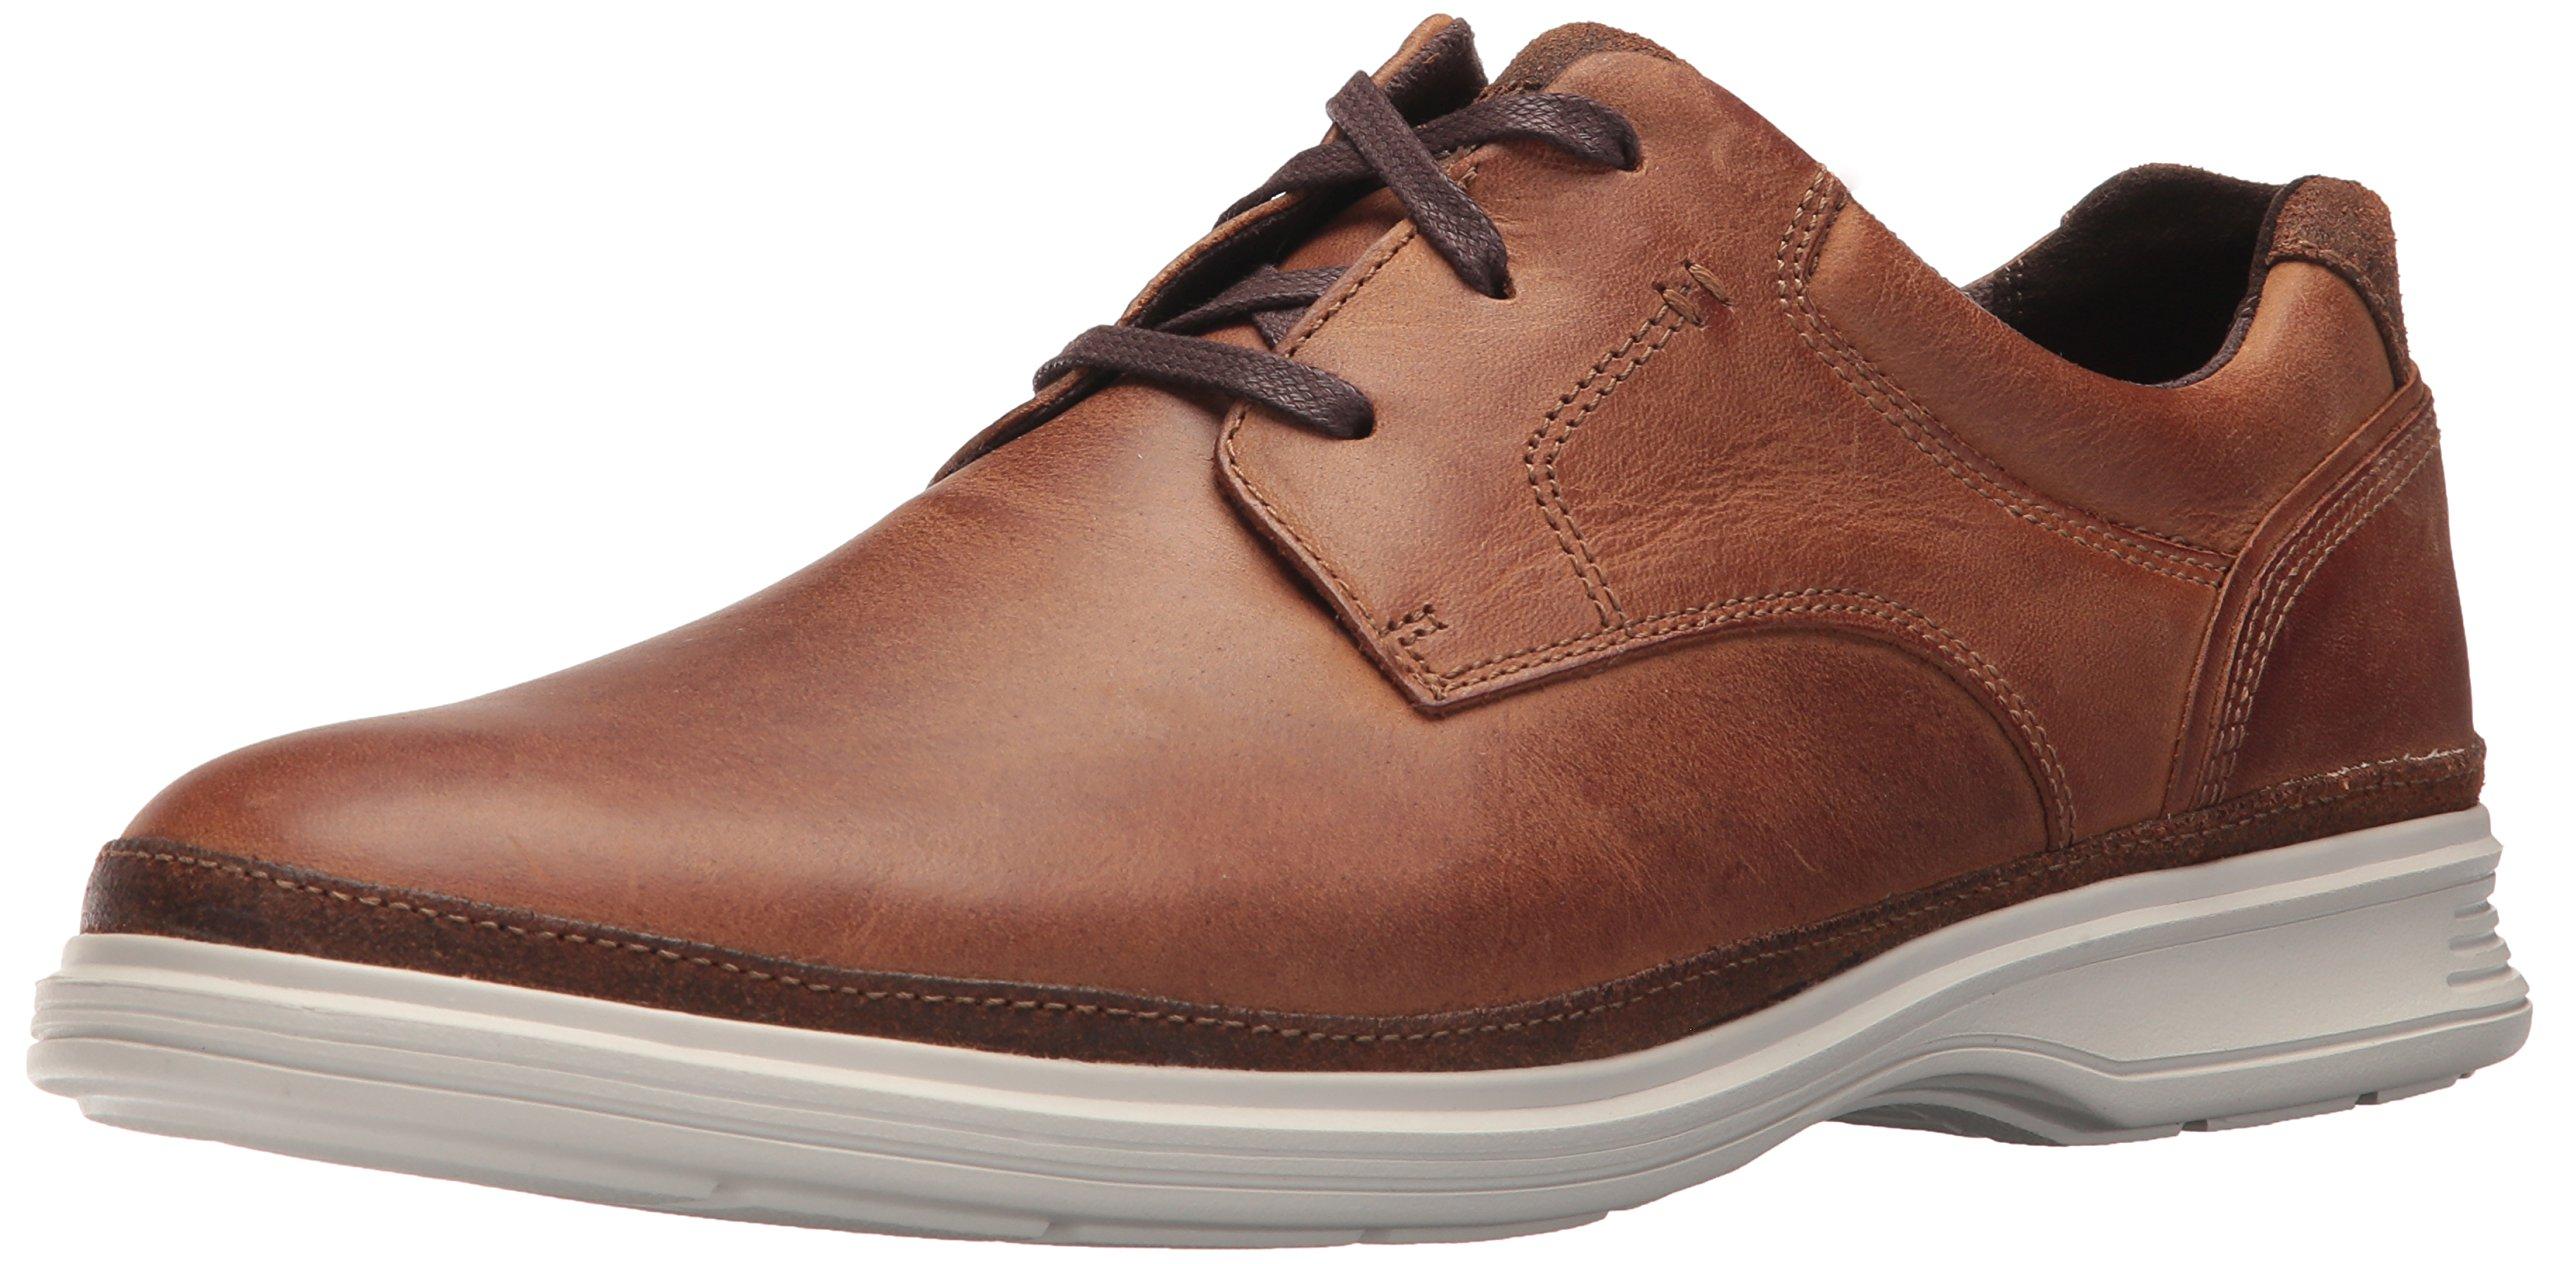 Rockport Men's DresSports 2 Go Plain Toe Shoe, new caramel, 15 M US by Rockport